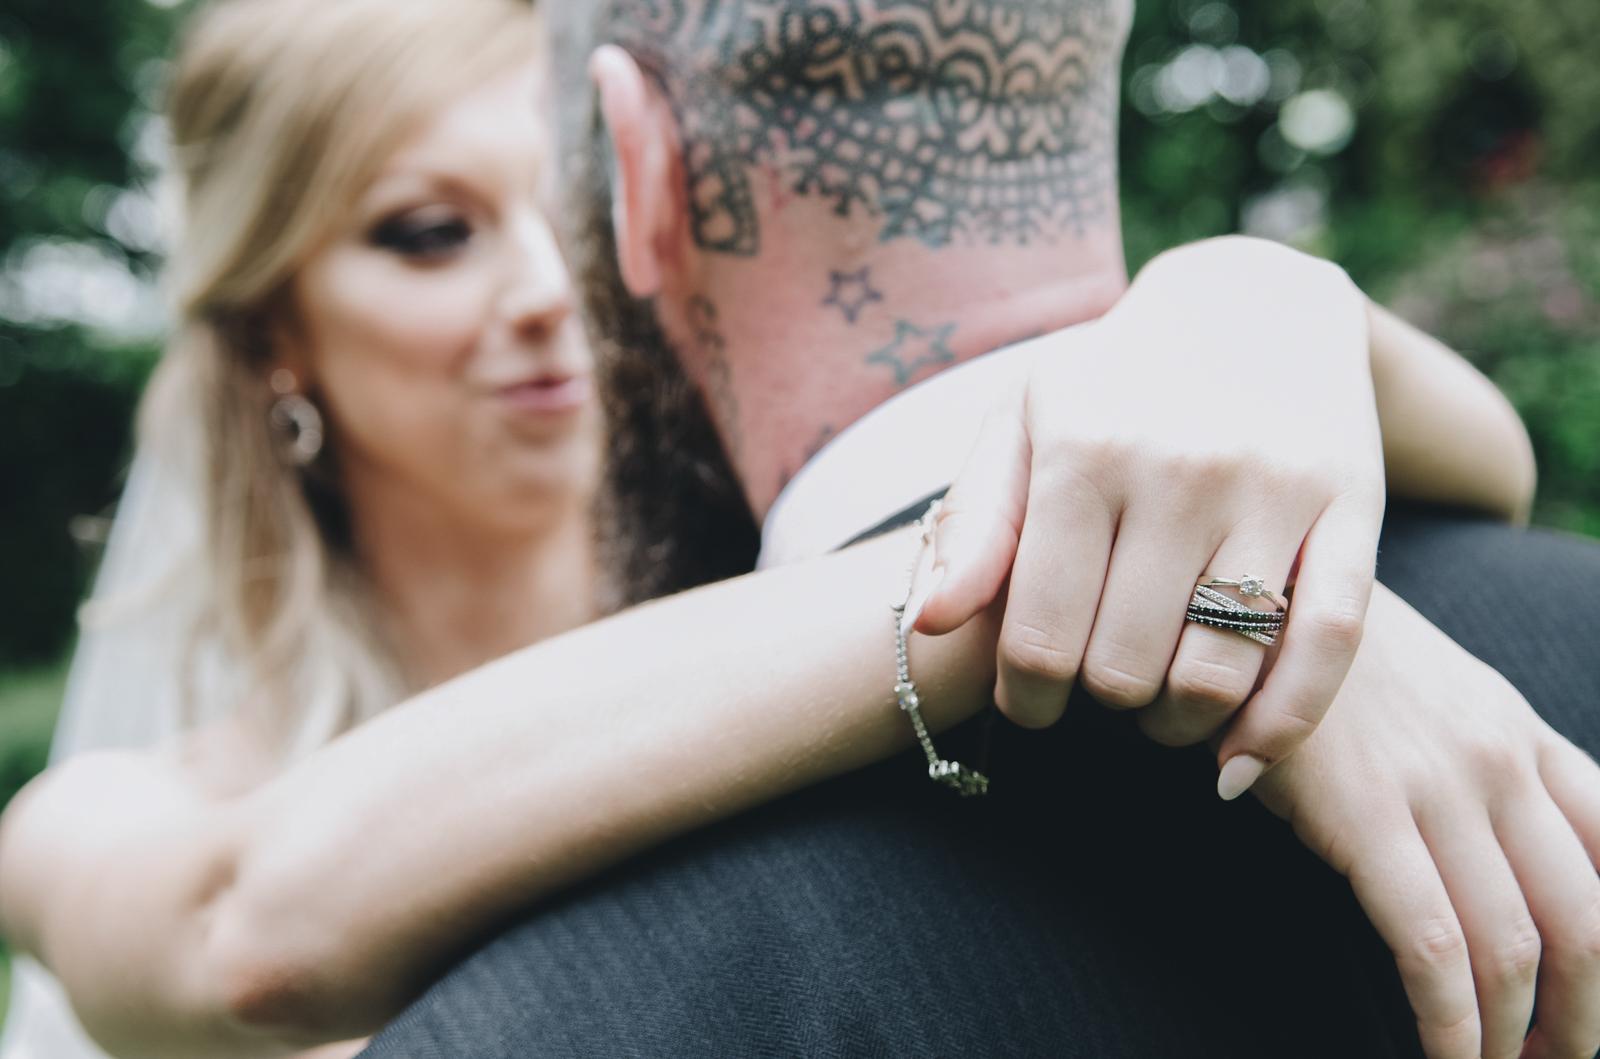 Alternative-North-West-Manchester-Wedding-Photography-Astley-bank-Wedding-skull-cake-tattooed-groom-23.jpg